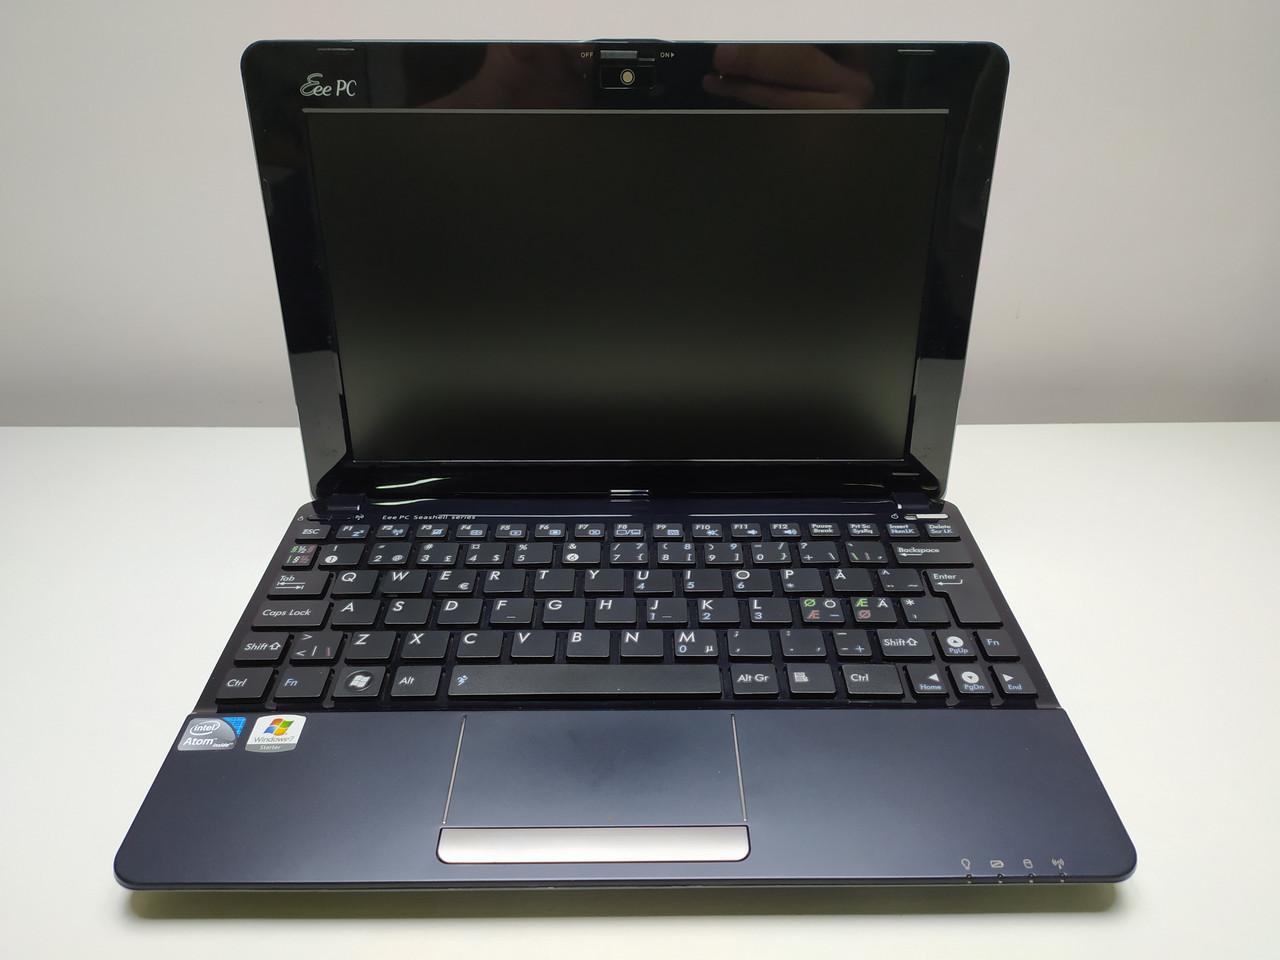 "Ноутбук Asus Eee PC 1015PN /Intel Atom N550 1.5GHz/2Гб/10.1""/NVIDIA ION 2"